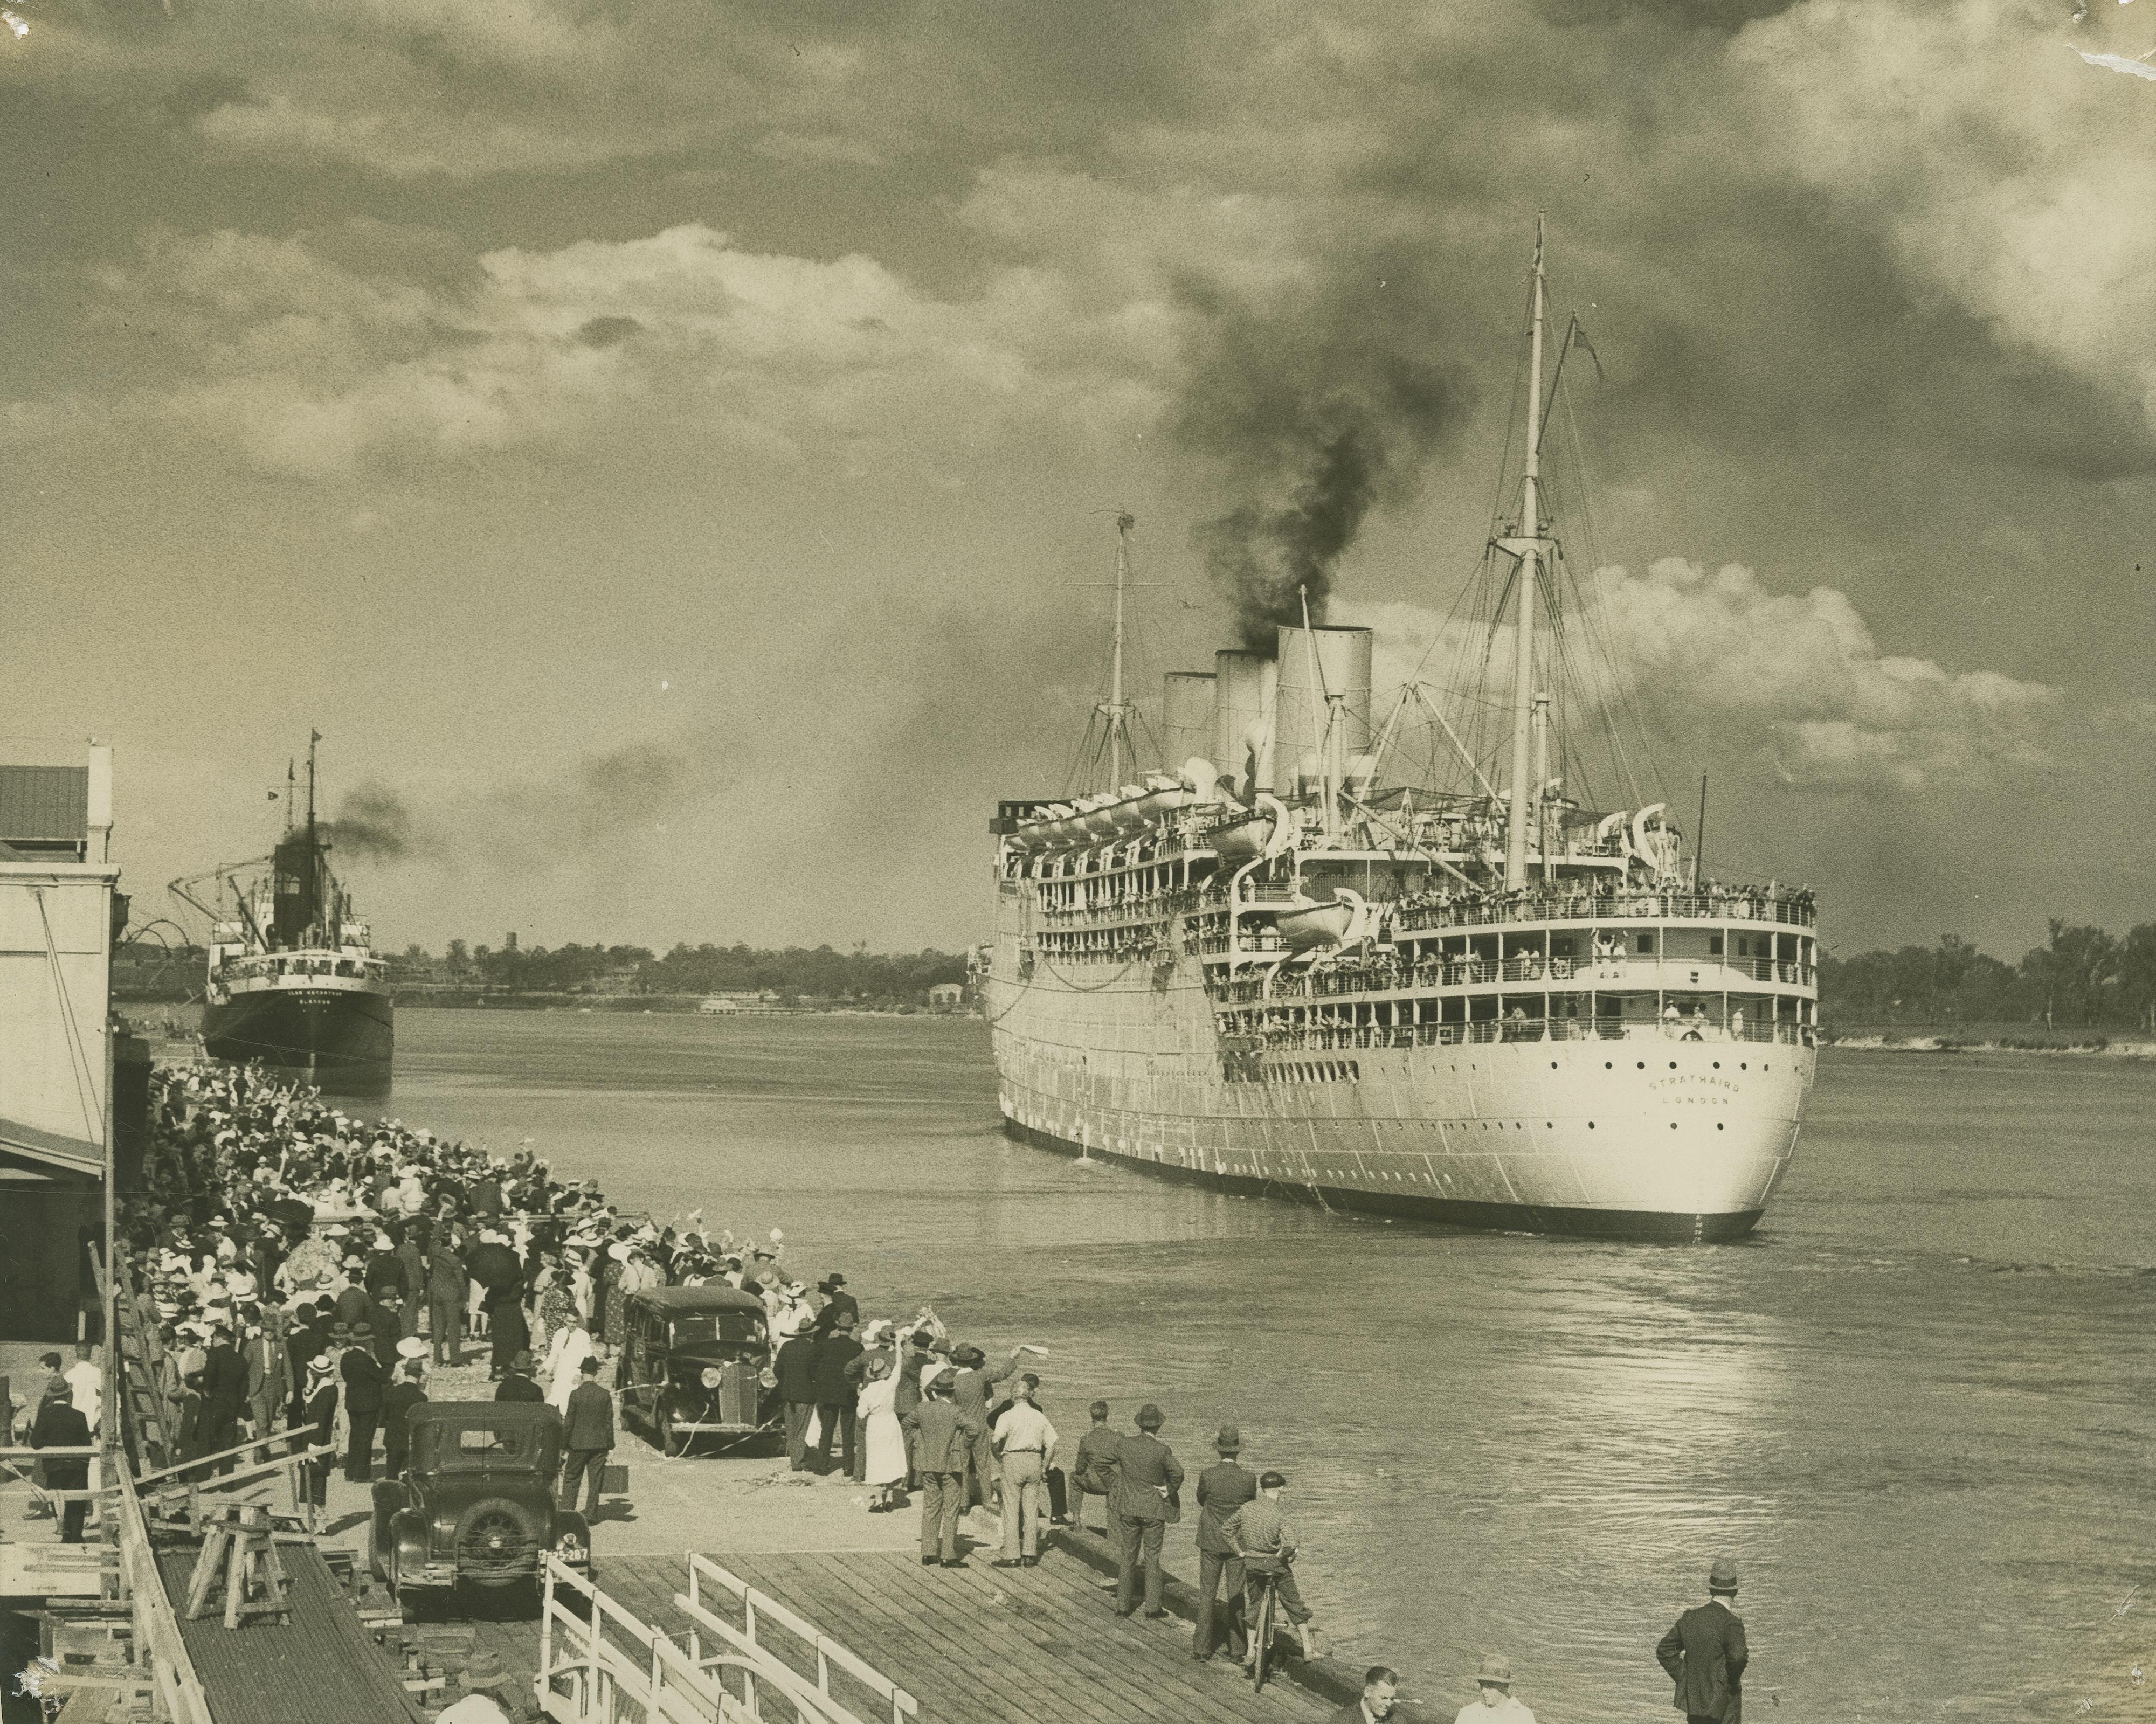 FileStateLibQld 1 250796 Cruise Ship Strathaird Leaving